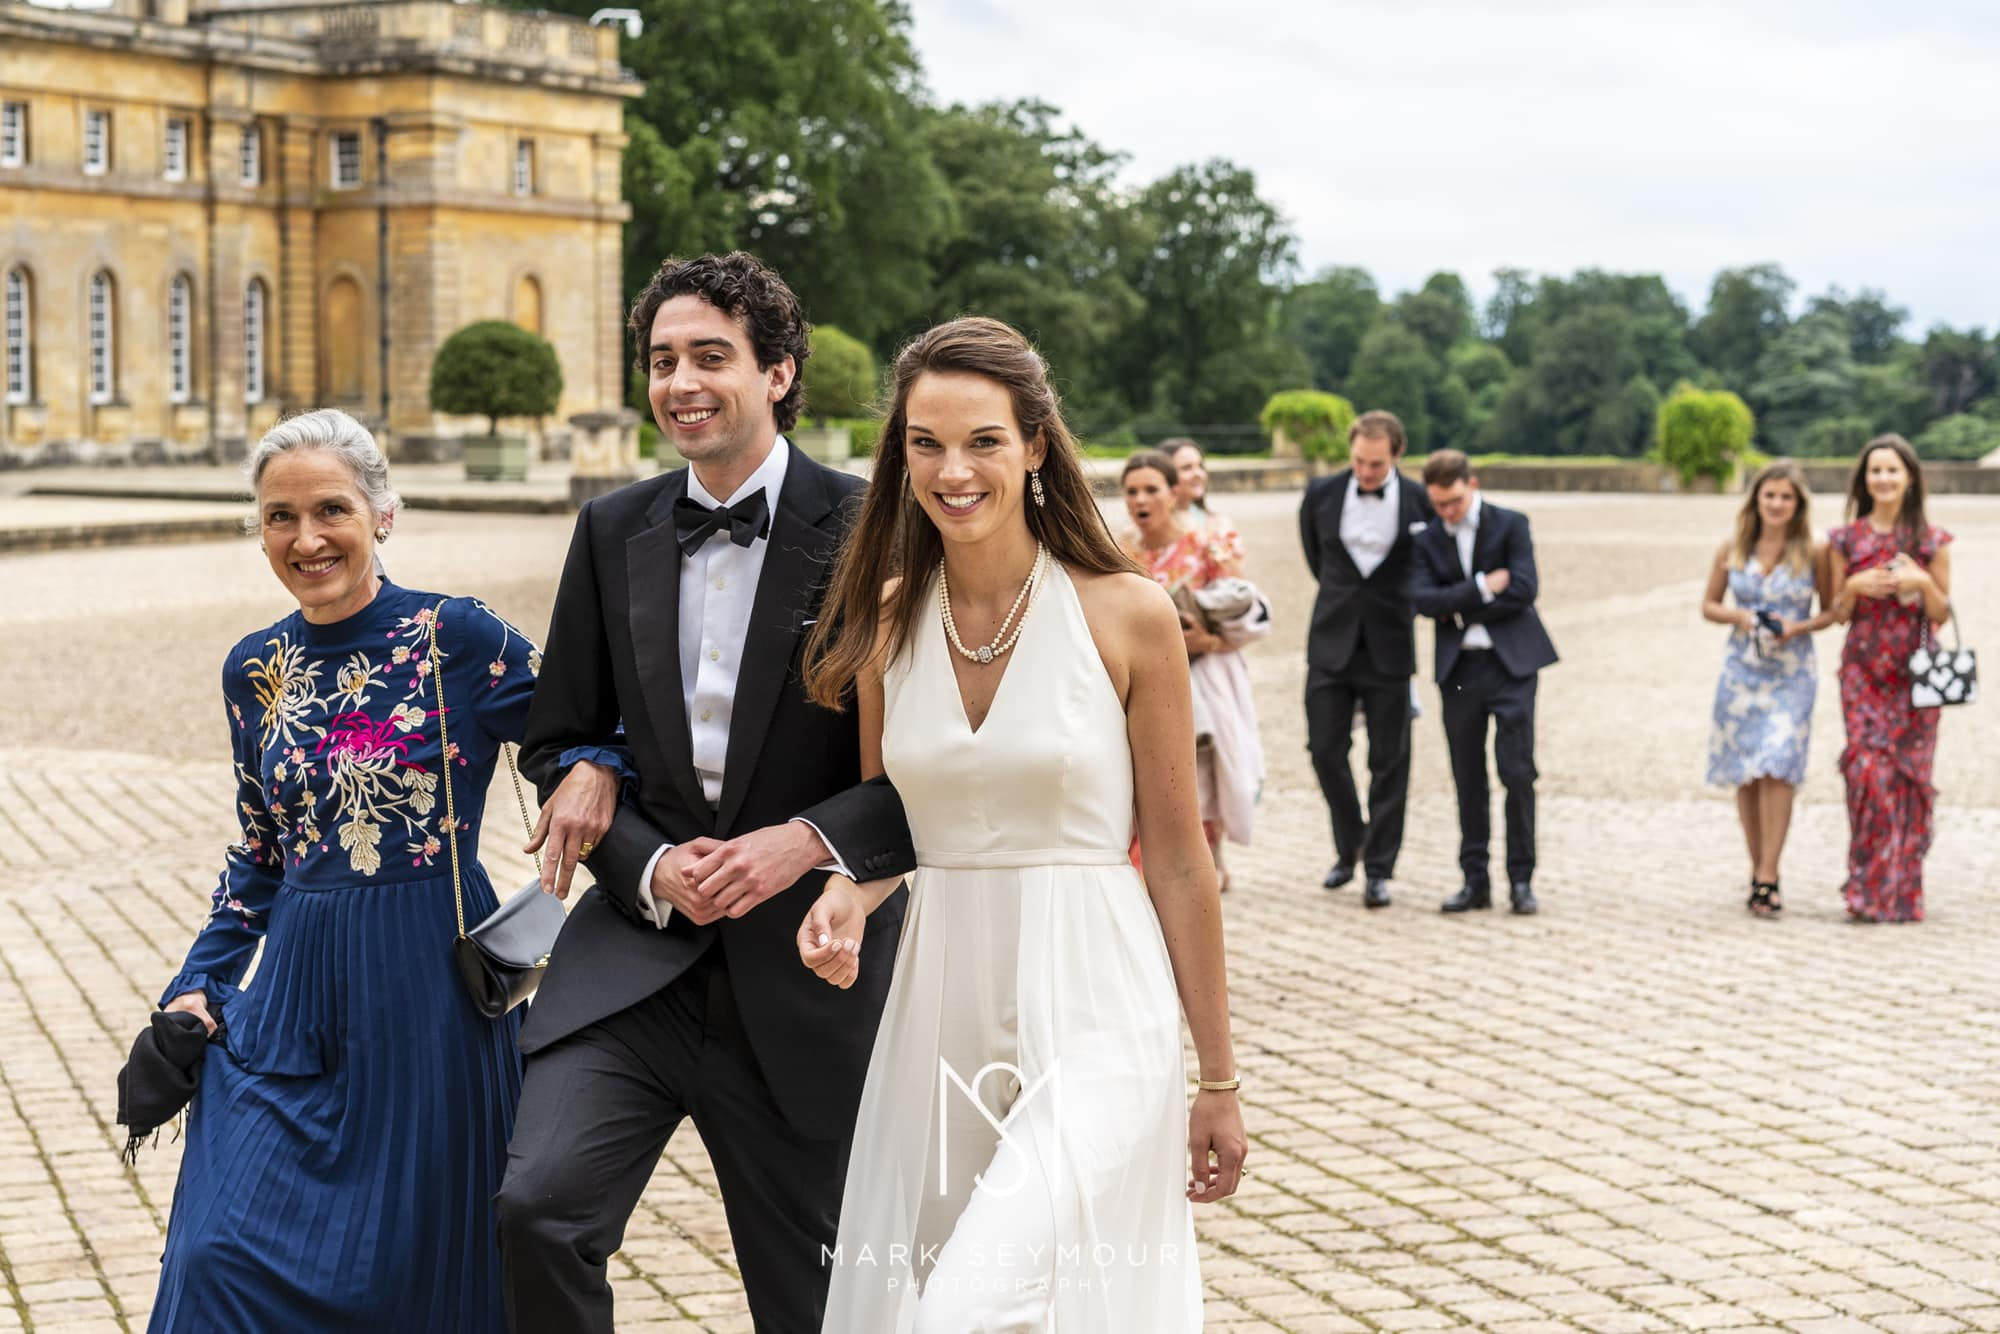 Blenheim Palace Wedding Photographer 5